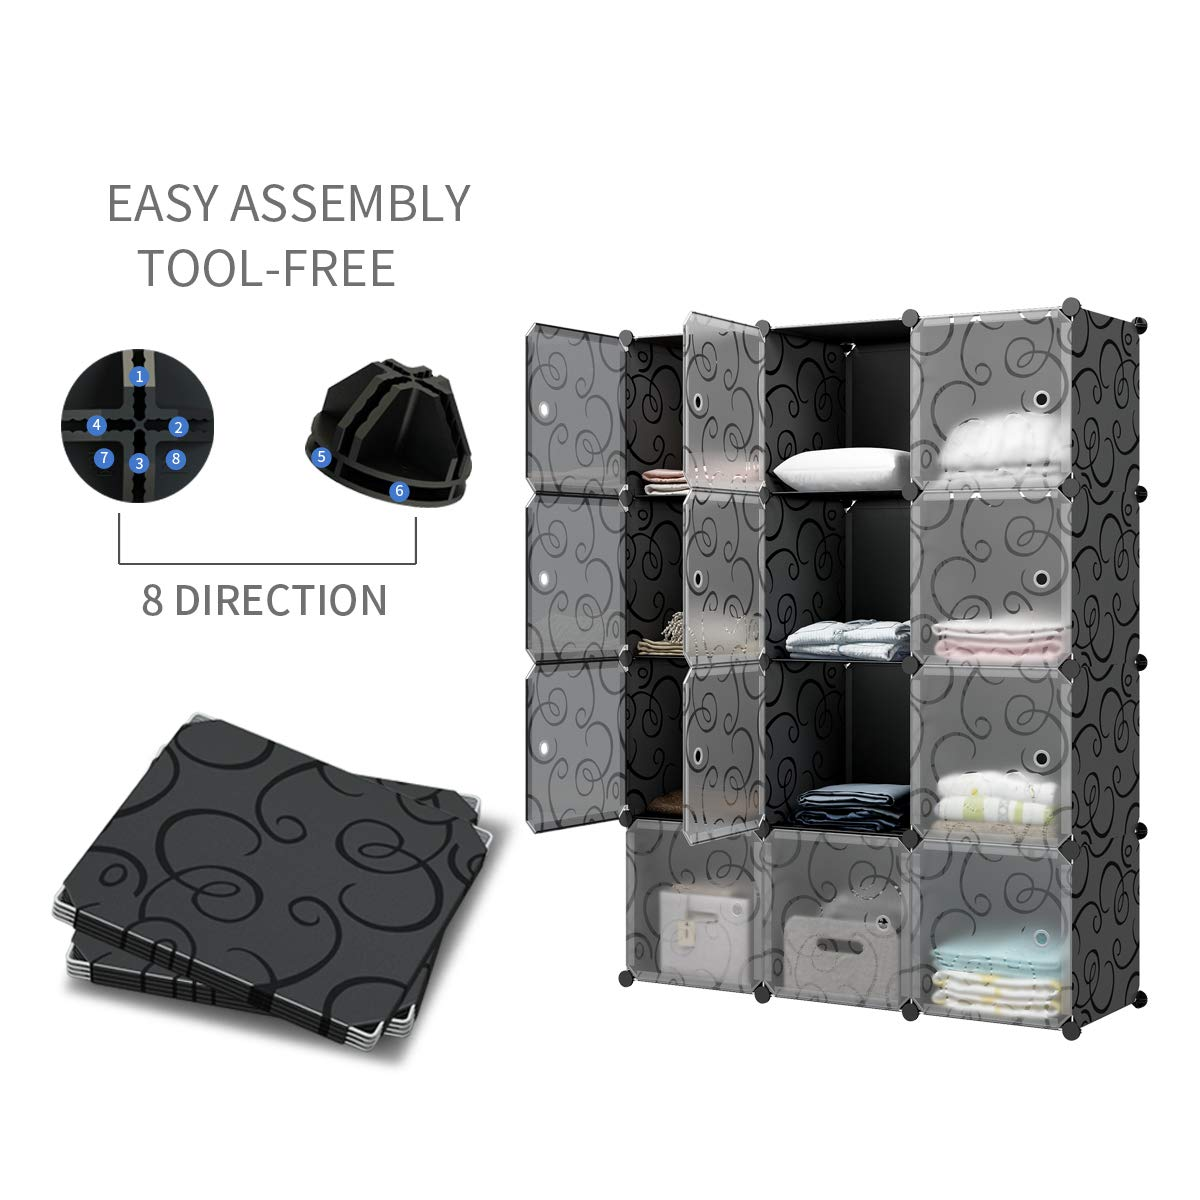 KOUSI Portable Storage Cube Cube Organizer Cube Storage Shelves Cube Shelf Room Organizer Clothes Storage Cubby Shelving Bookshelf Toy Organizer Cabinet, Black, 12 Cubes by KOUSI (Image #5)